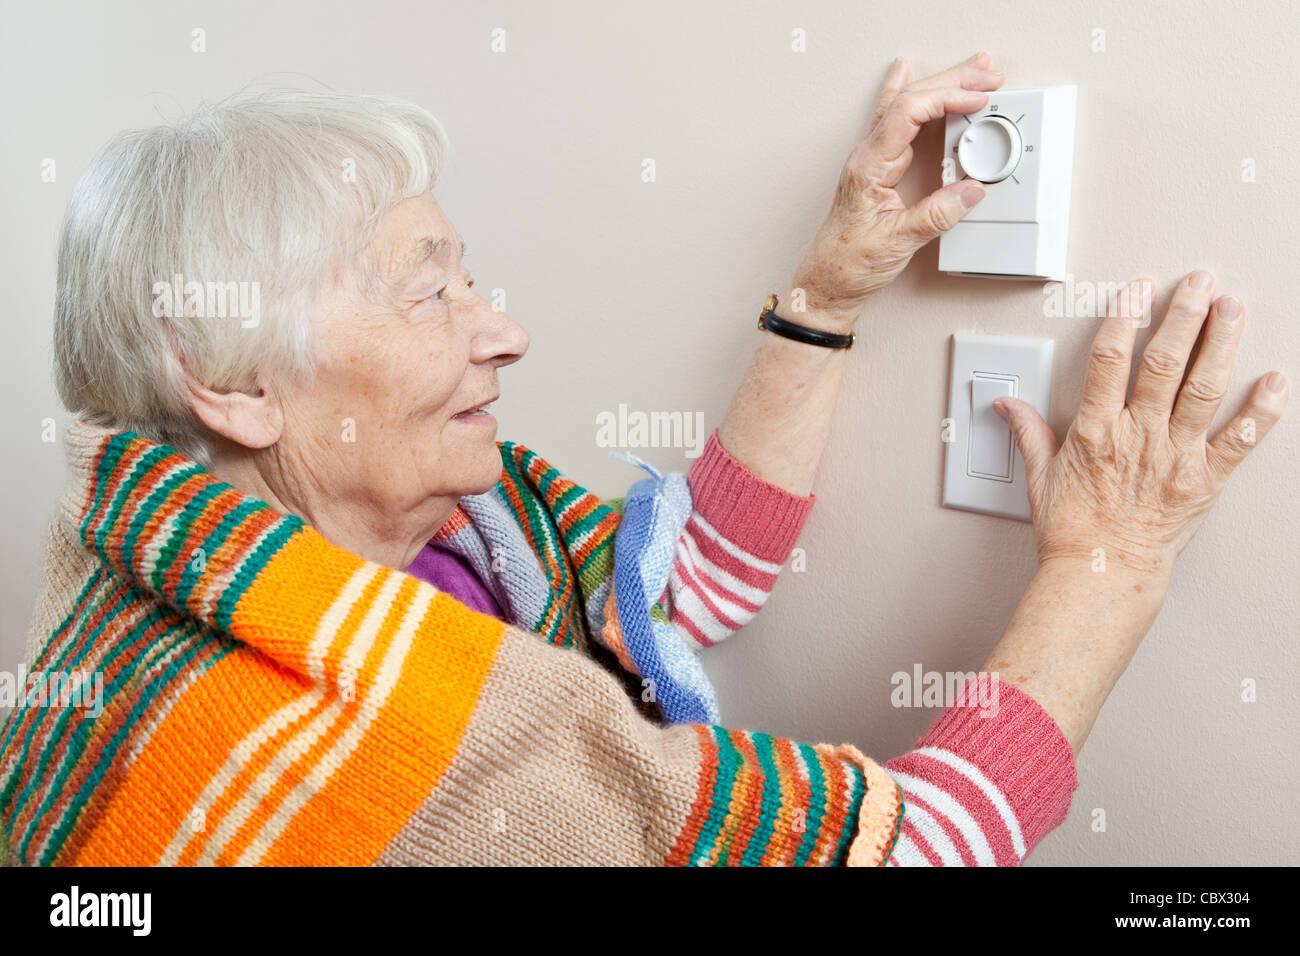 Senior woman adjusting her thermostat - Stock Image